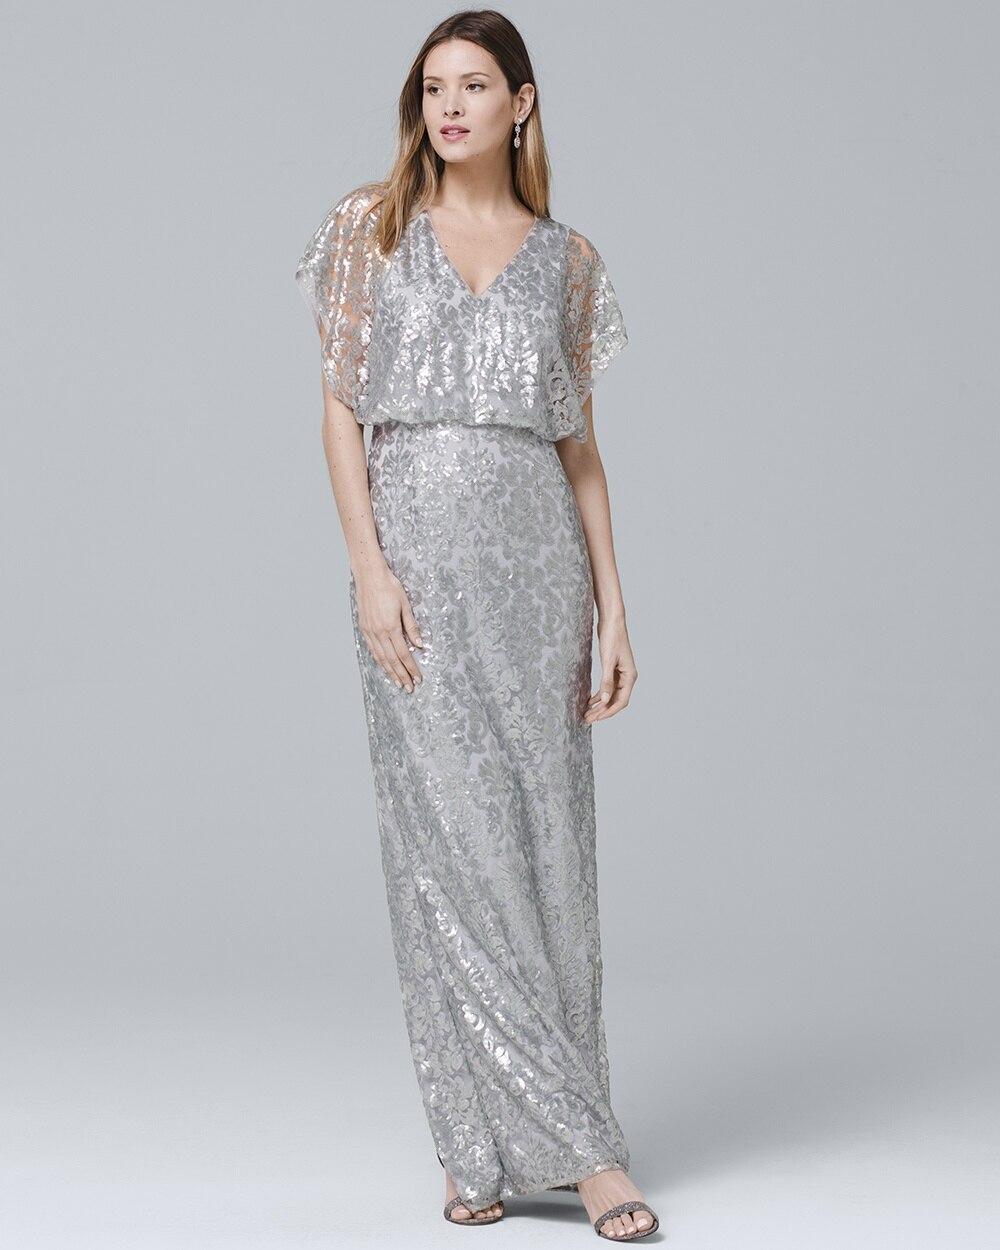 0a47a94ffbe Sequin Blouson Gown - White House Black Market